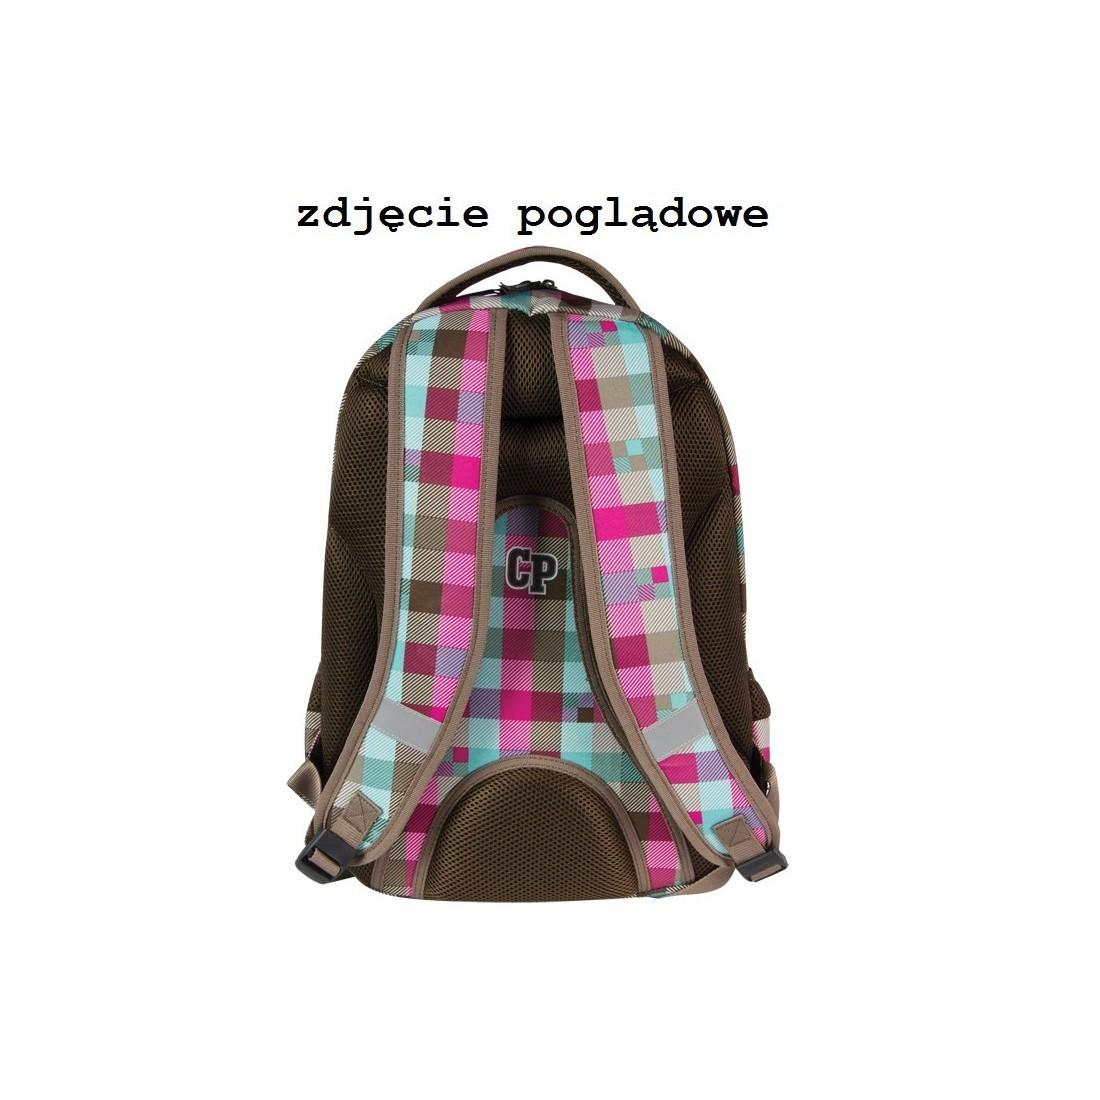 PLECAK MŁODZIEŻOWY COOLPACK 2w1 COMBO PASTEL CHECK CP 122 - kratka - plecak-tornister.pl